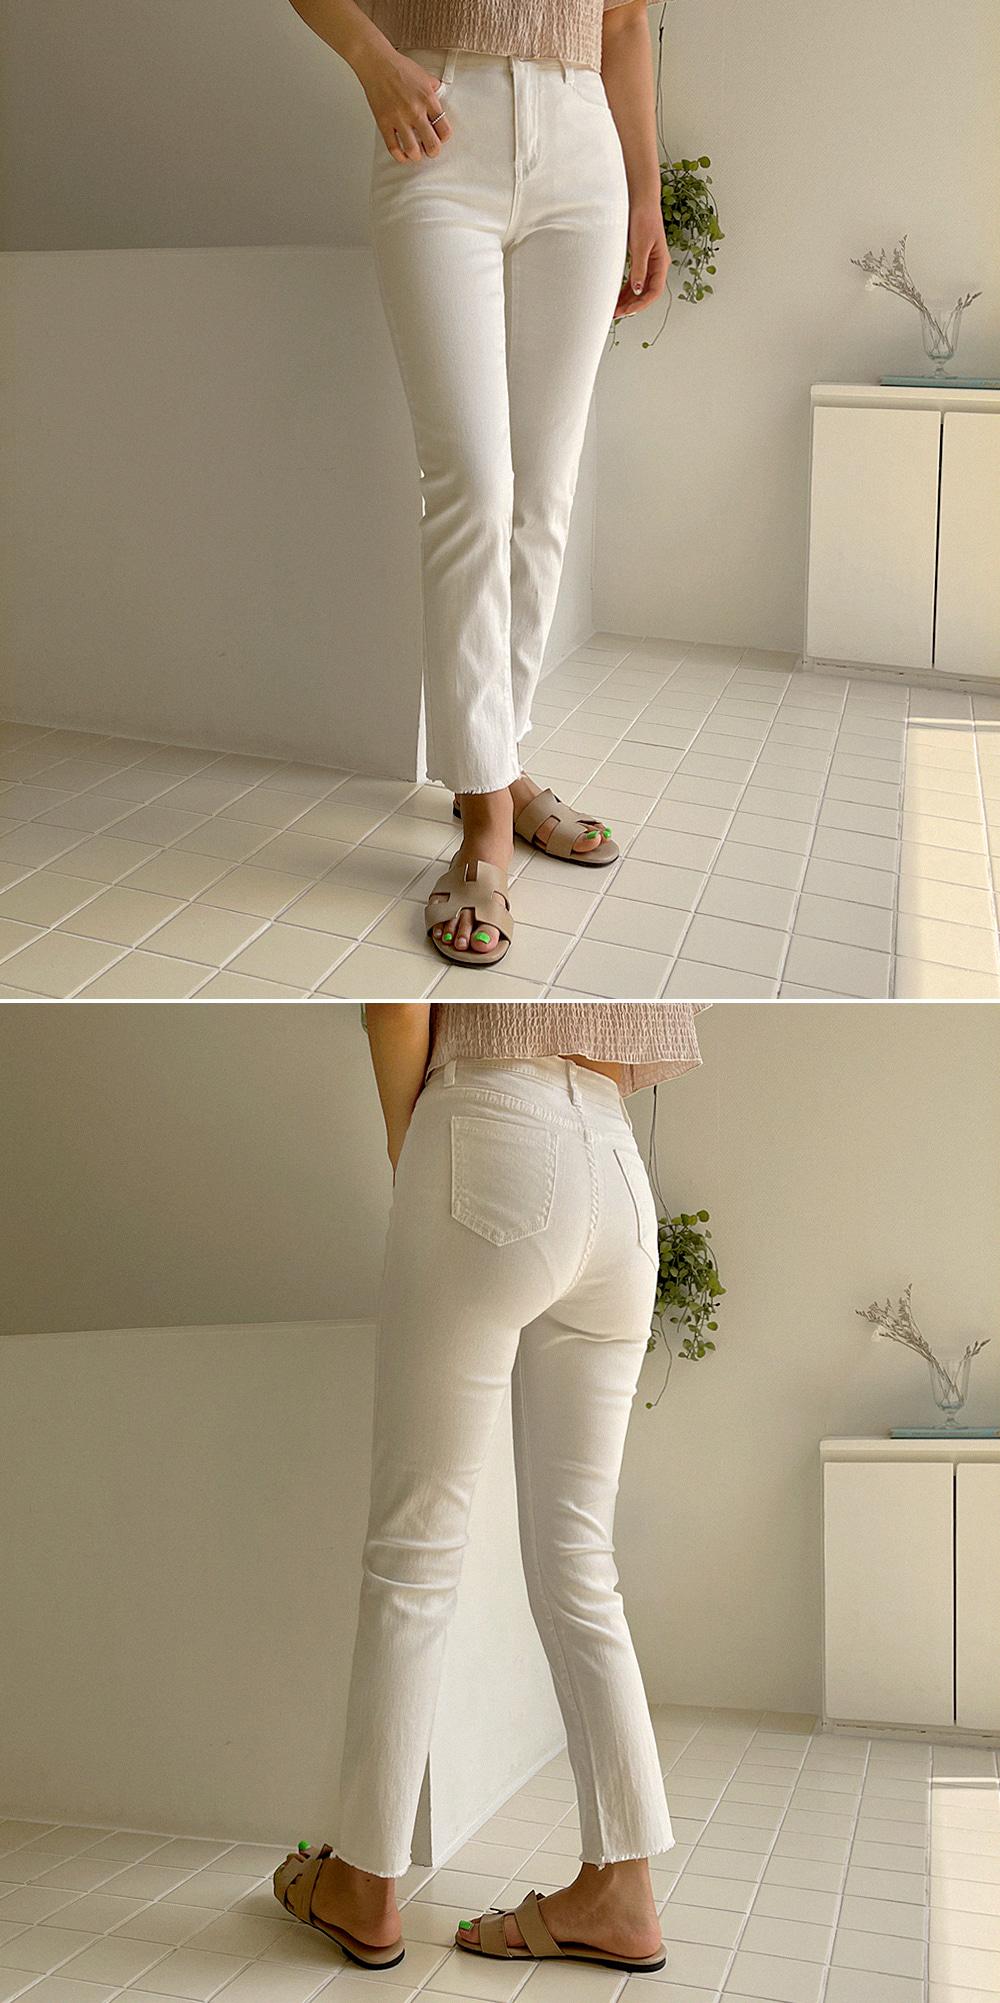 Prime Spandex Pants